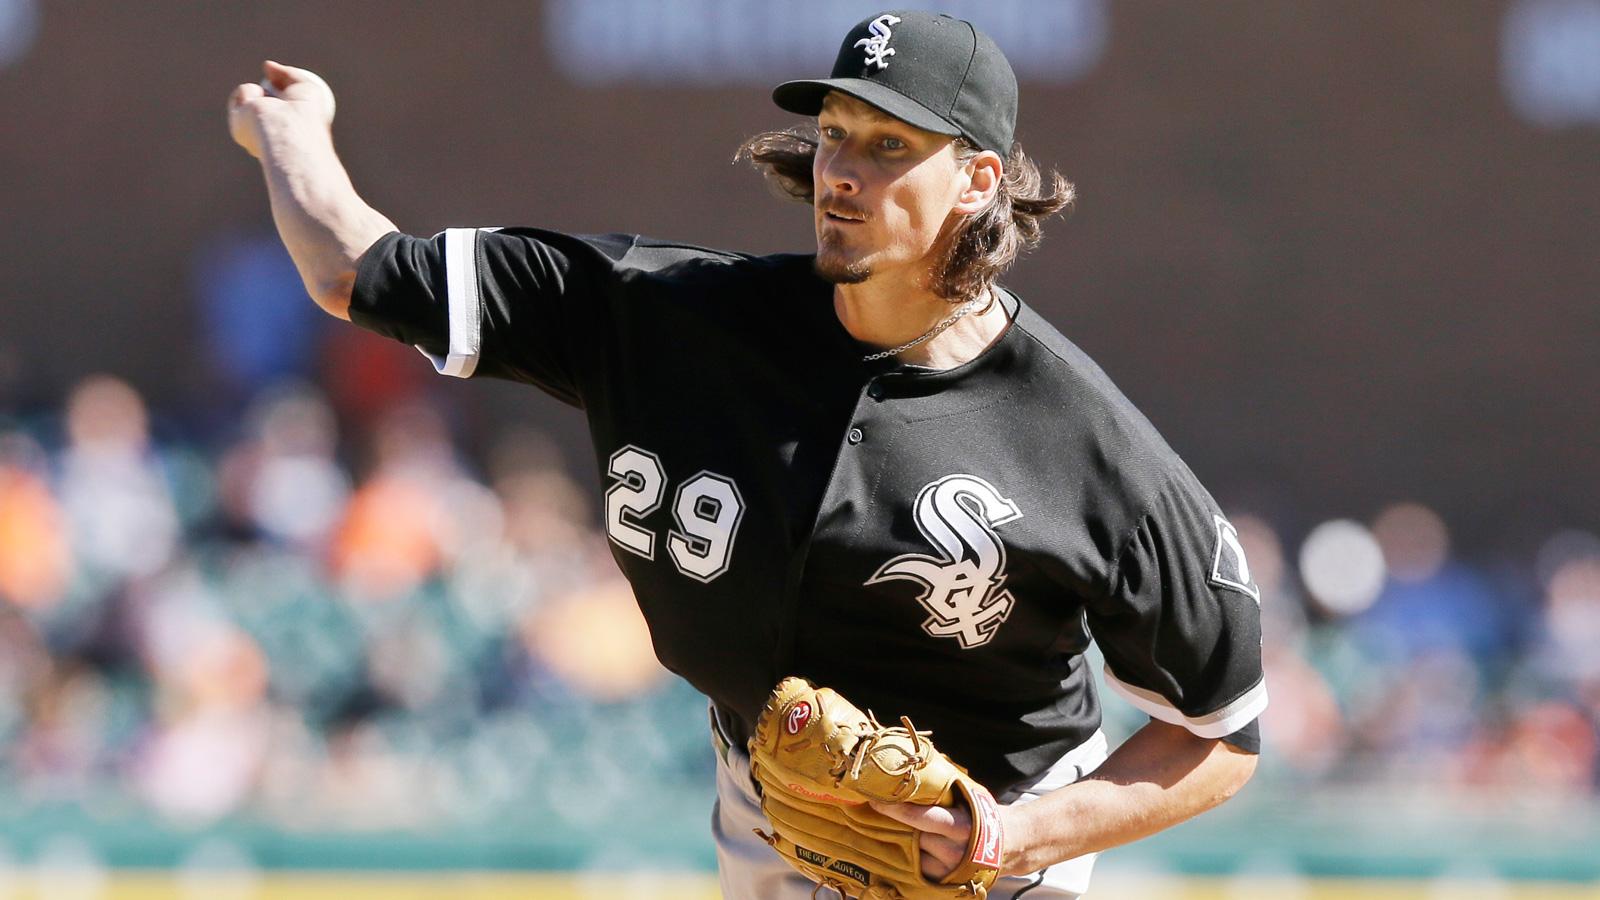 Samardzija's one-hitter leads White Sox over Tigers 2-0 in opener